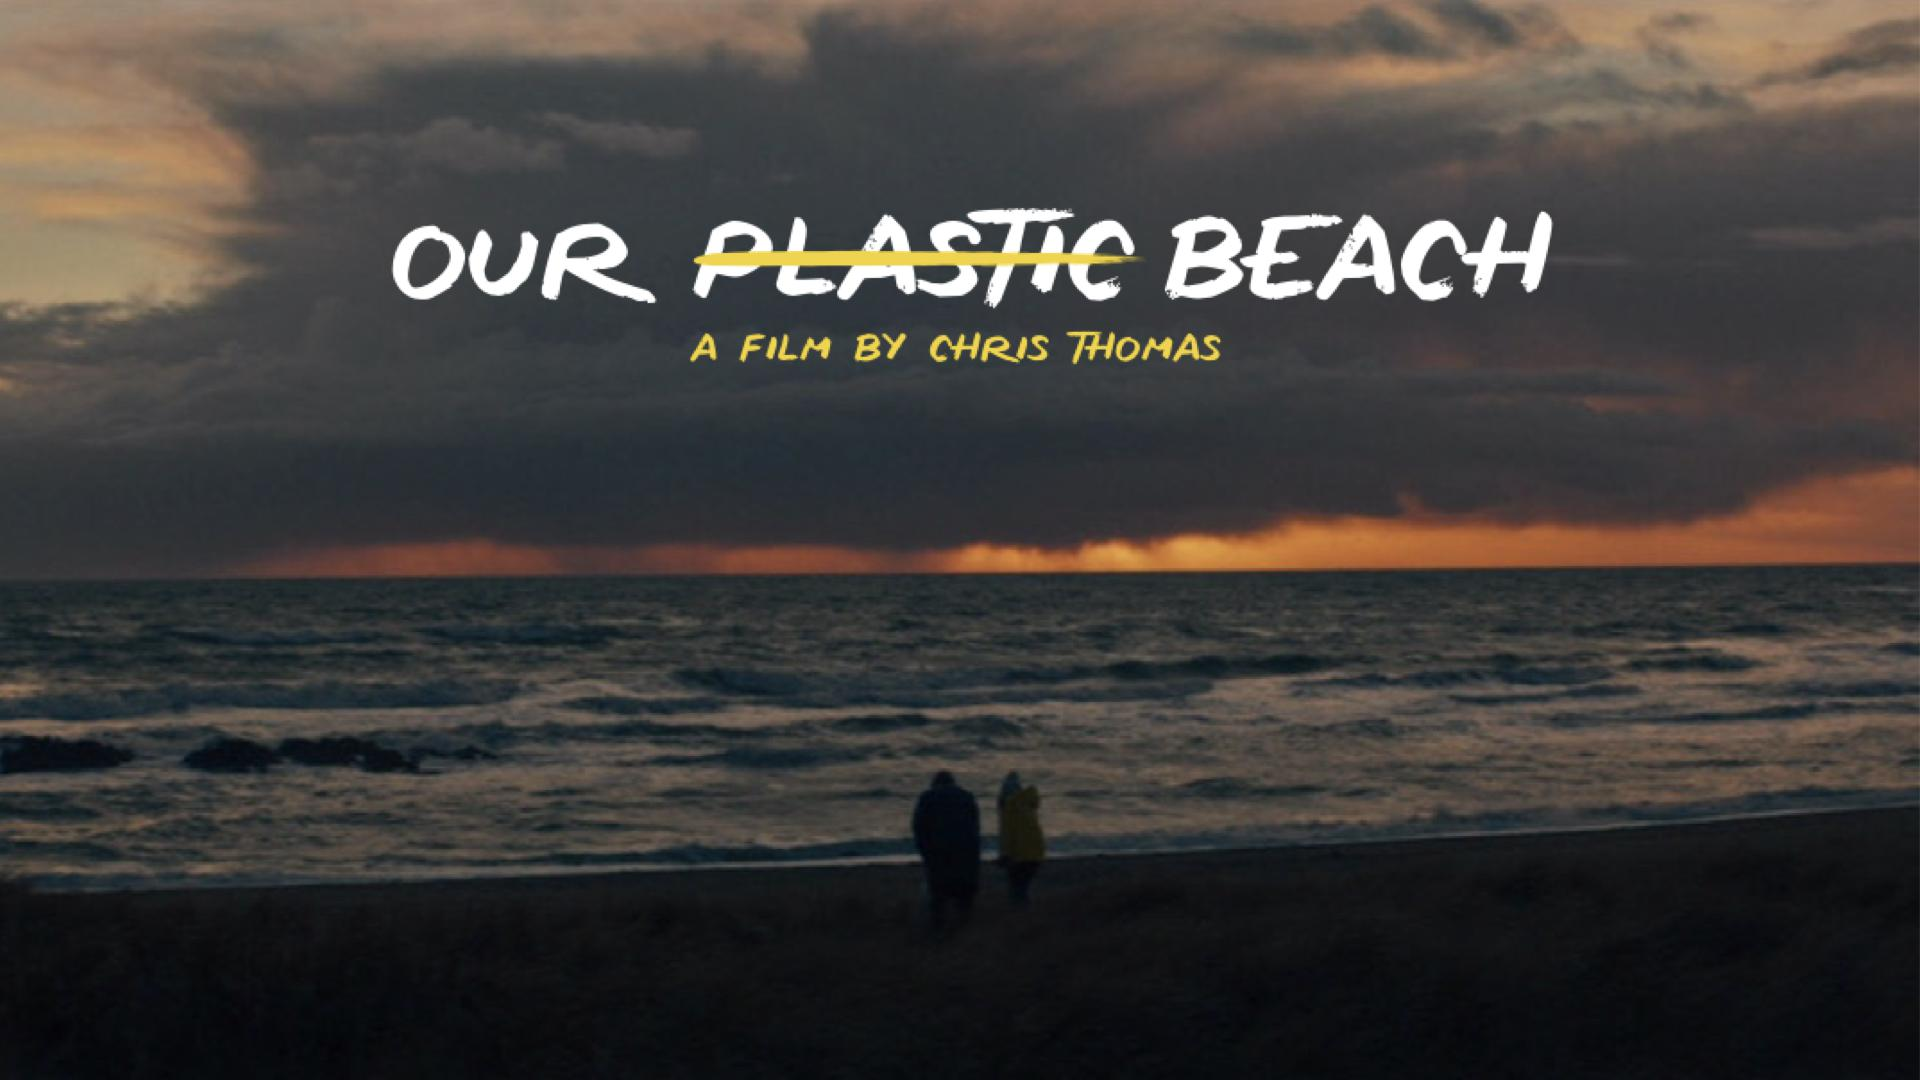 Our Plastic Beach